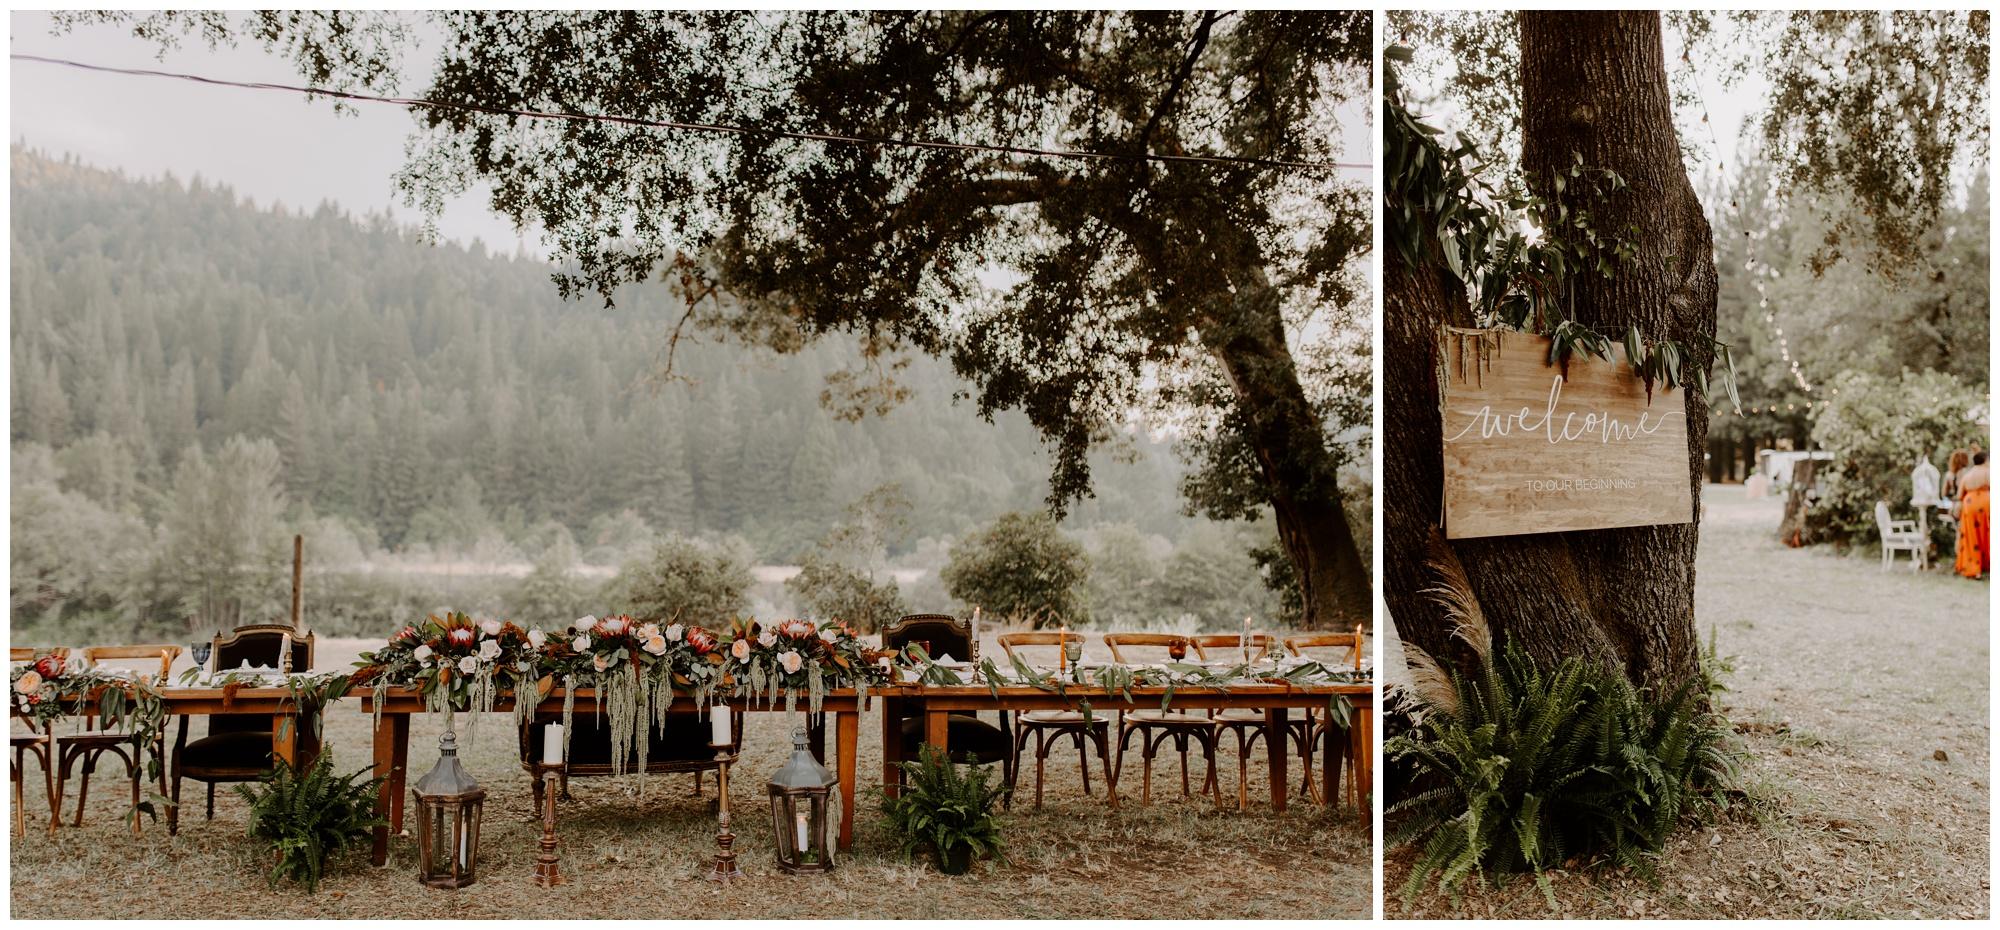 Redwood Festival Wedding Humbolt California - Jessica Heron Images_0061.jpg